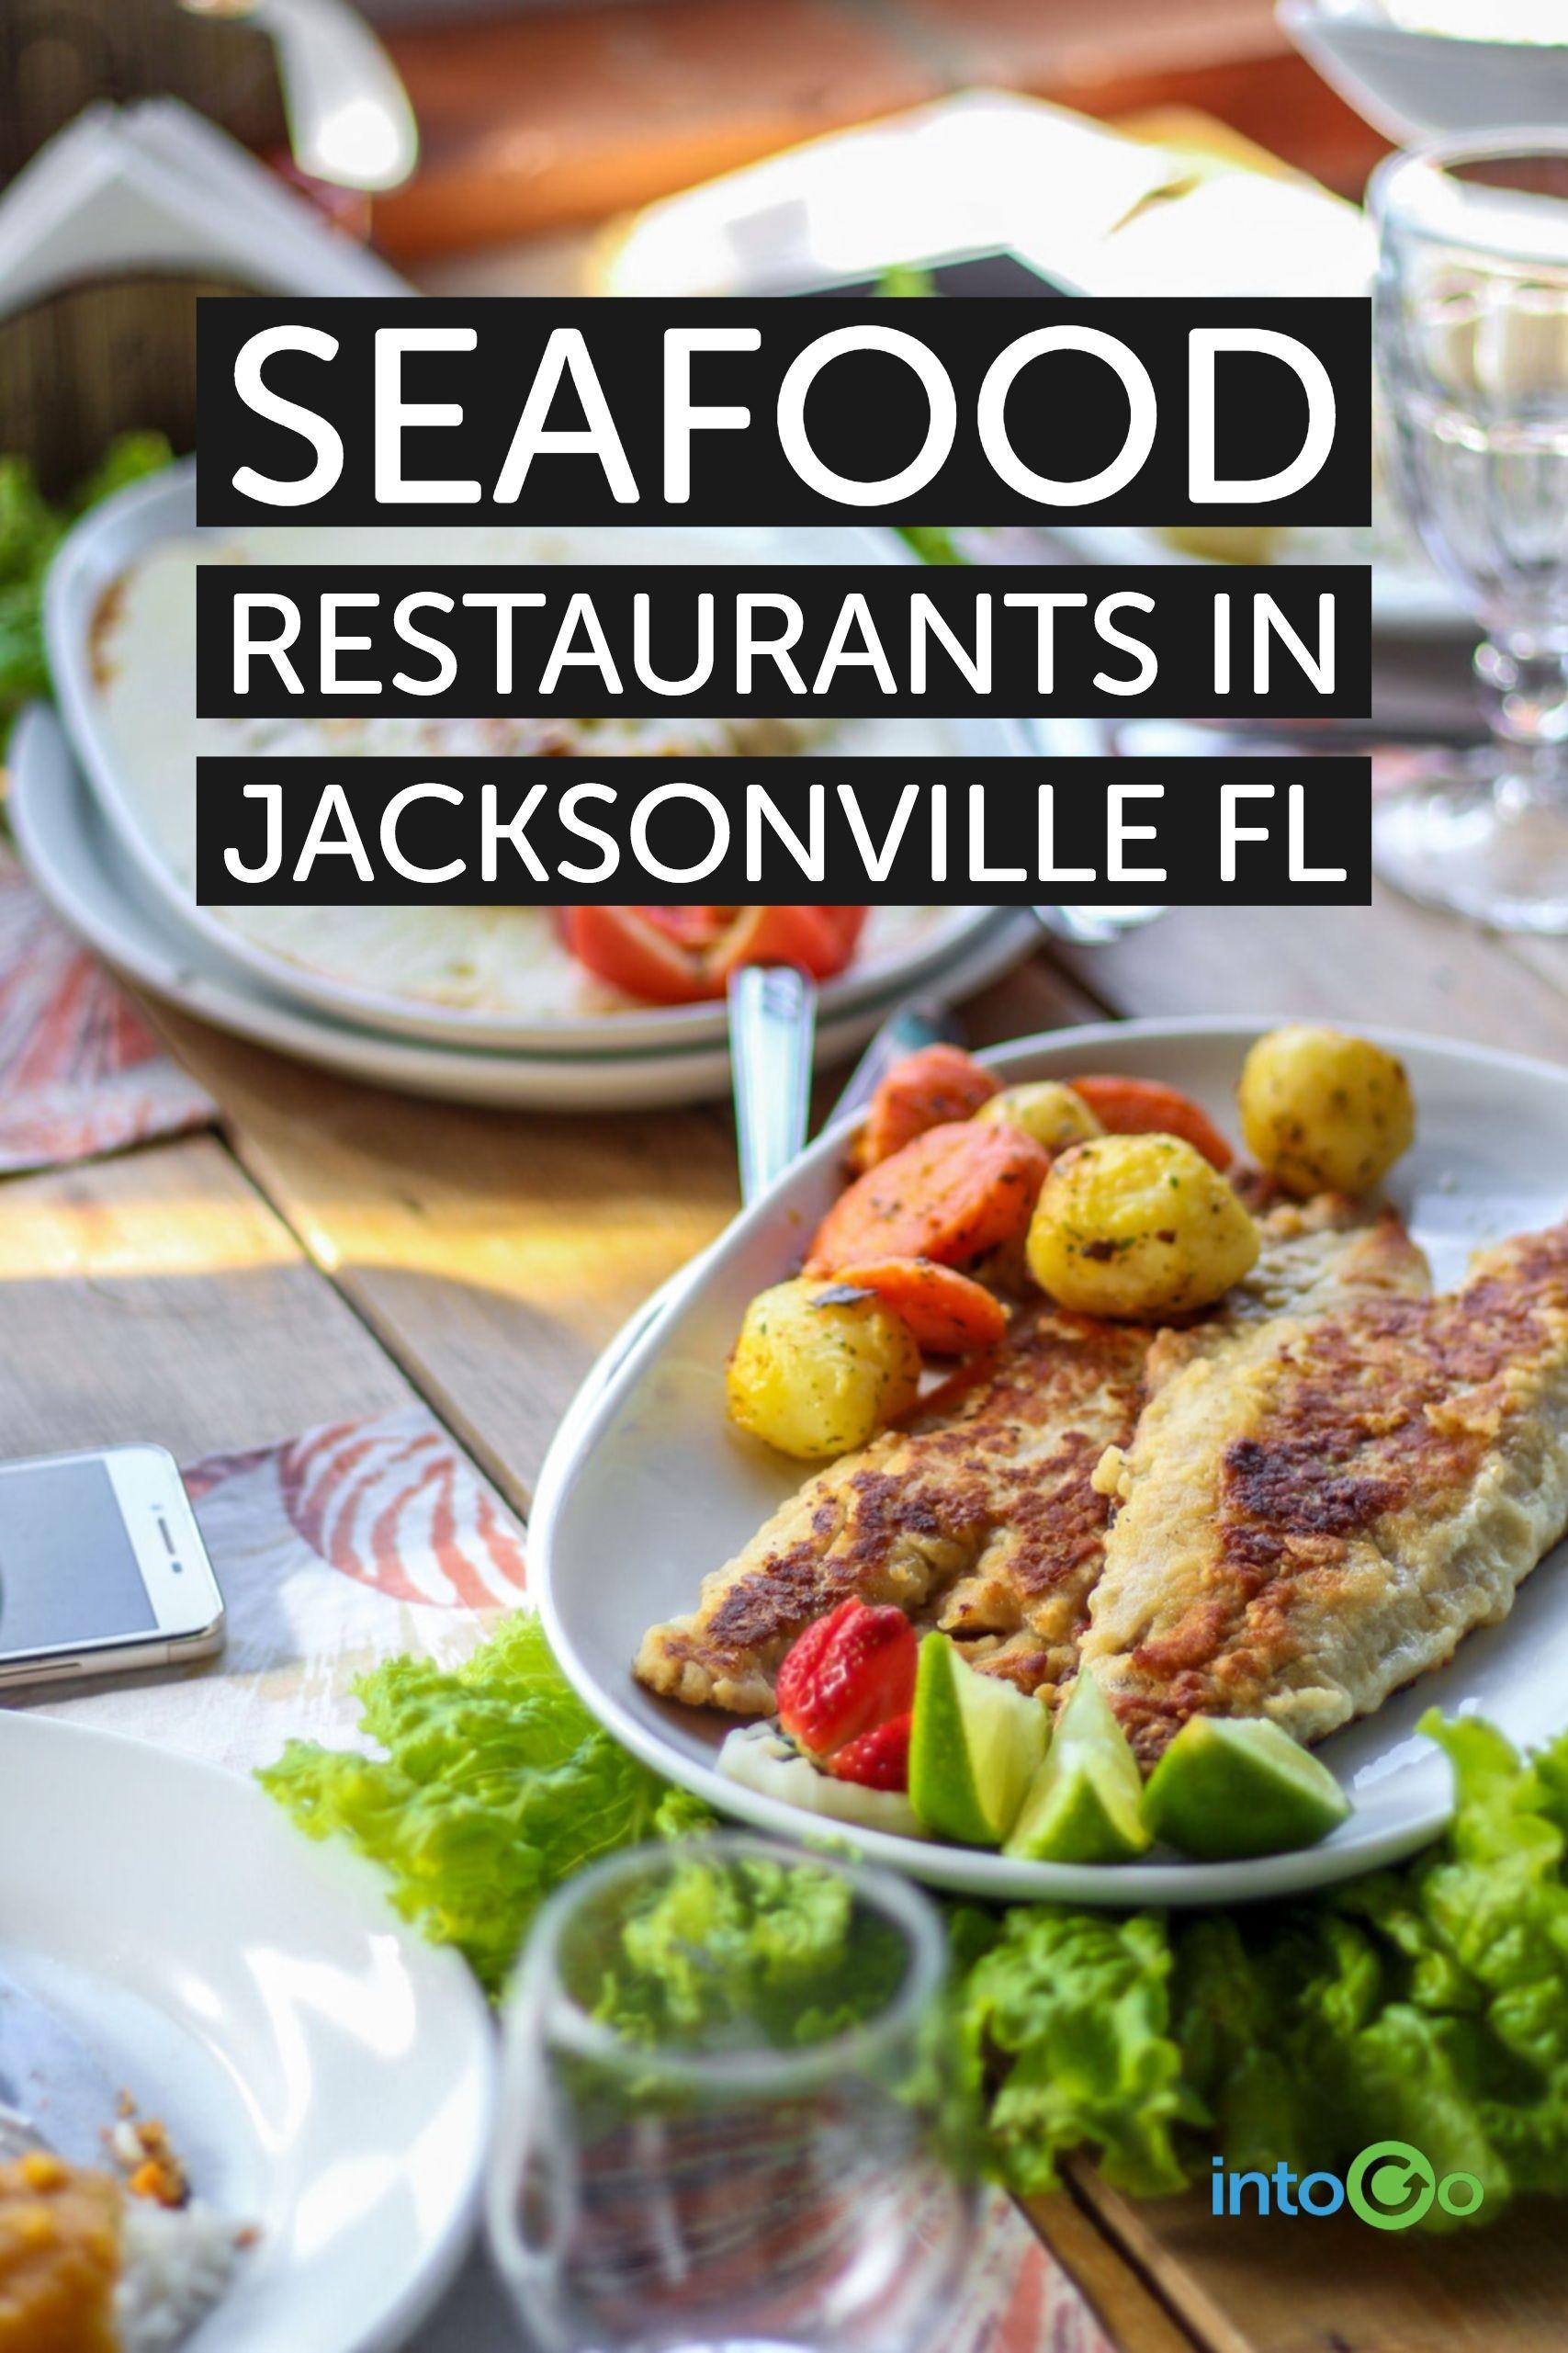 Amazing seafood restaurants in jacksonville intogo